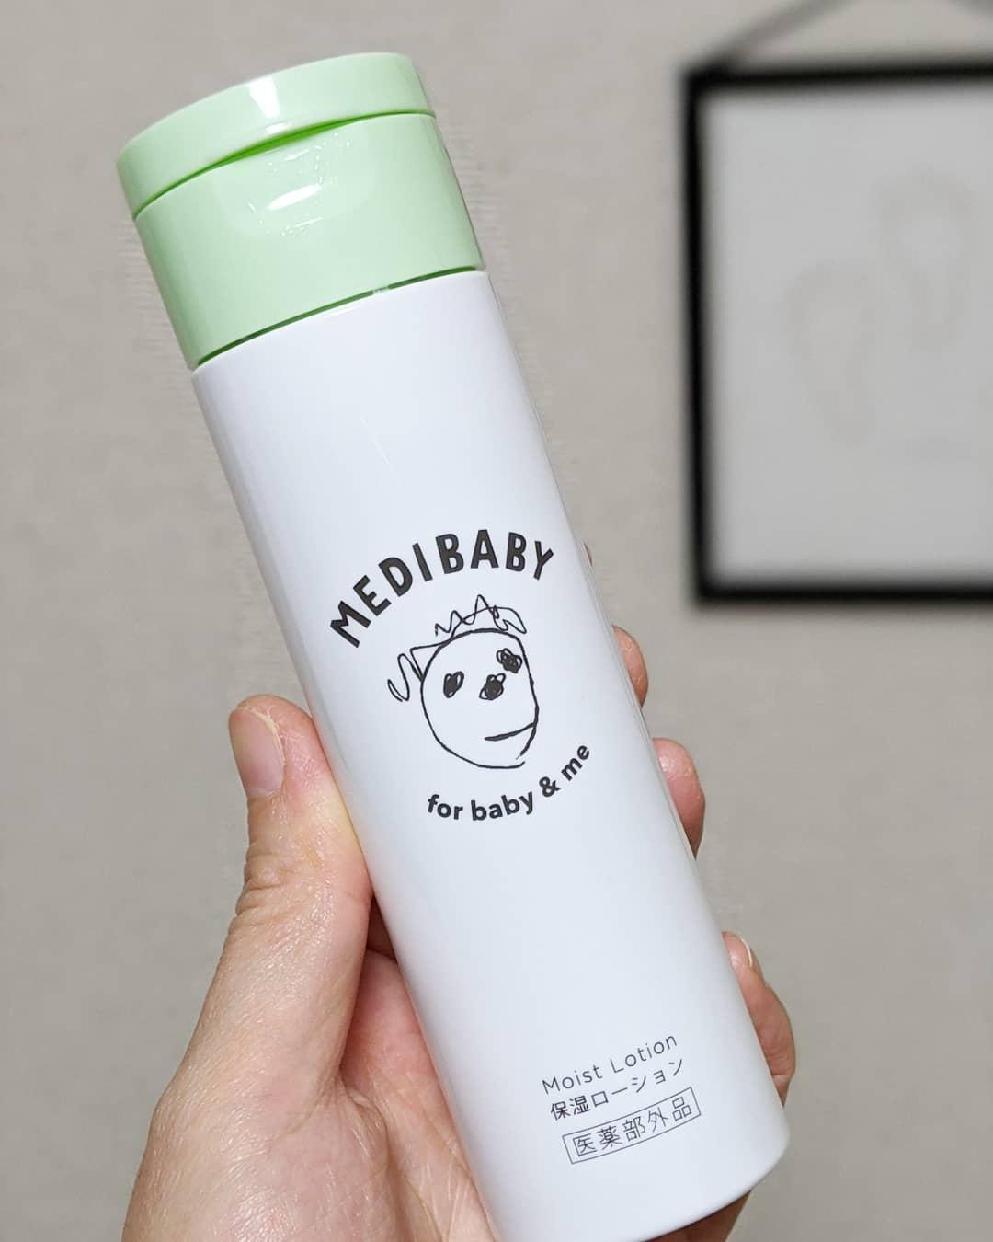 MEDIBABY FOR MOM(メディベビー フォー マム) 薬用モイストホワイトニングクリームに関するr_cosme_roomさんの口コミ画像2